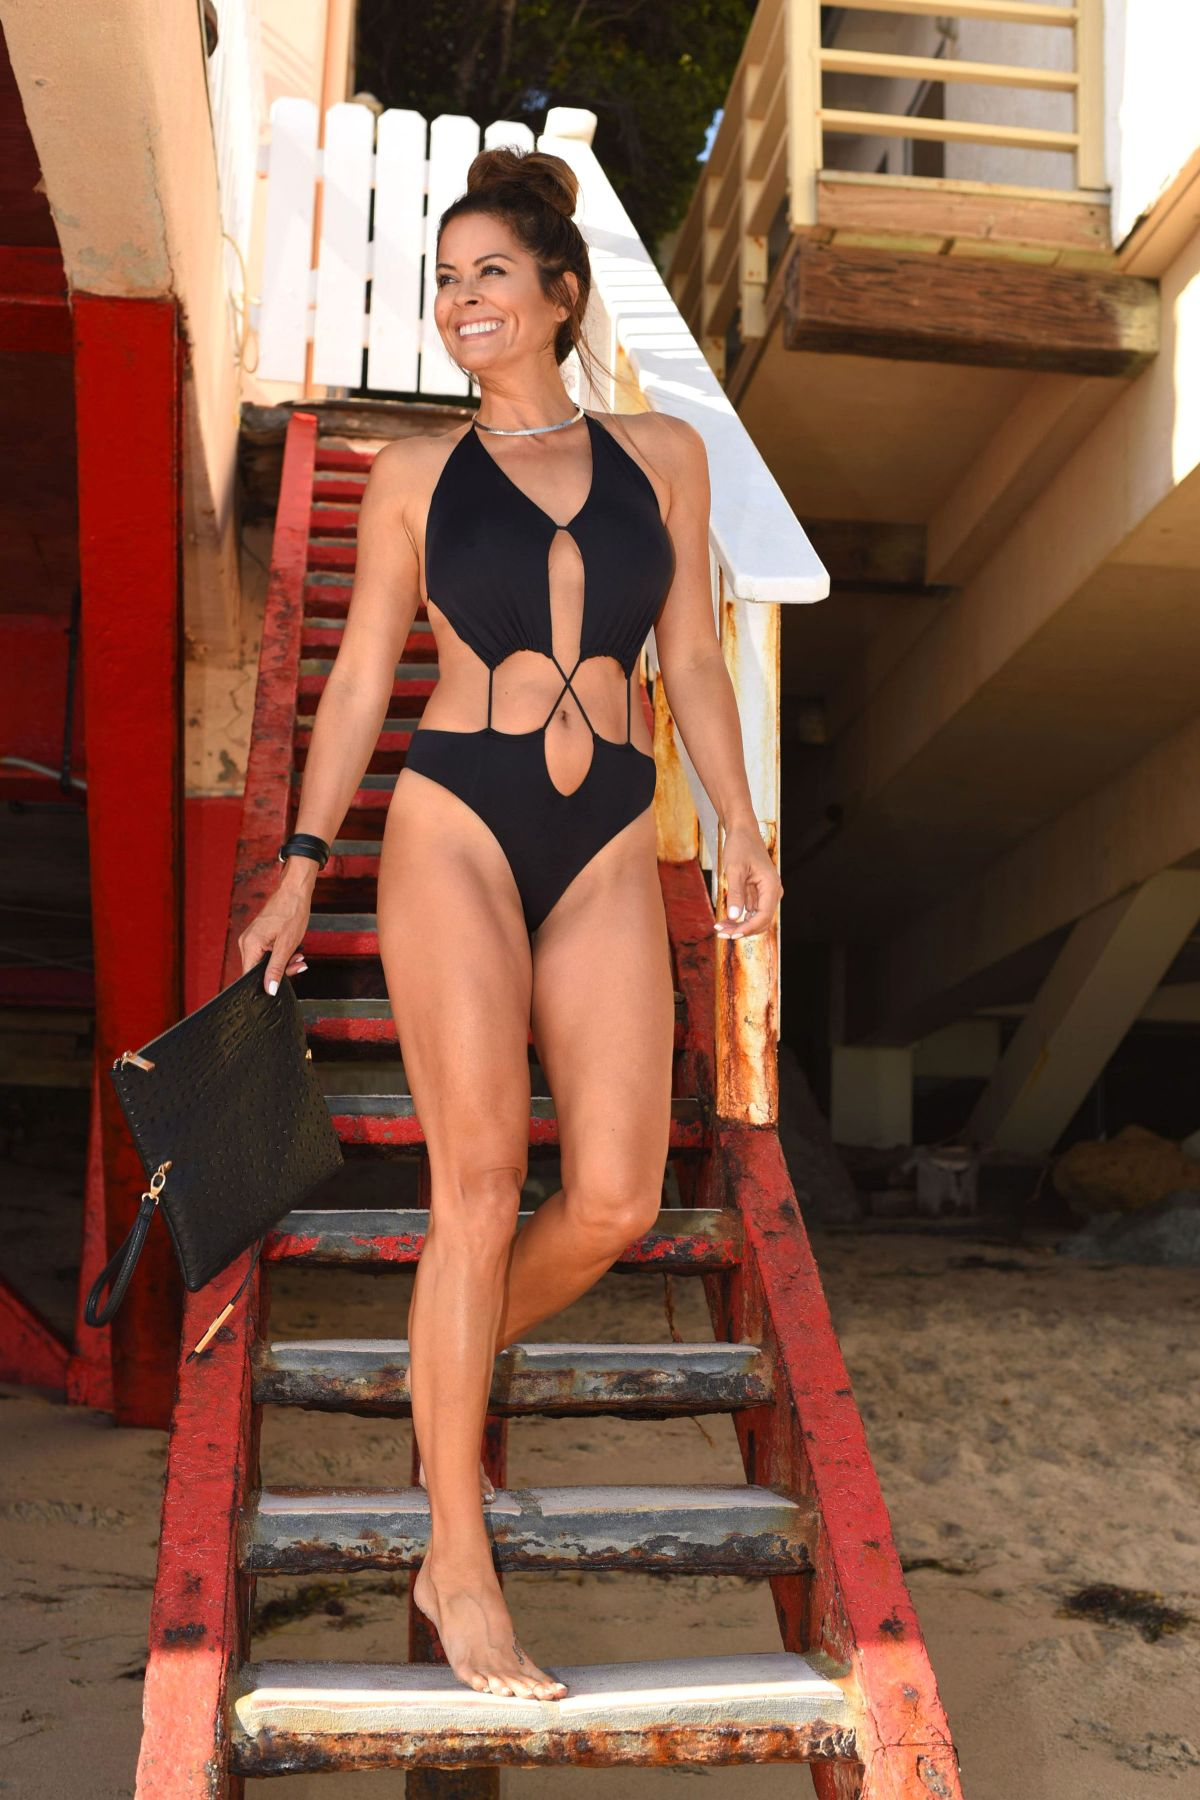 BROOKE BURKE in Swimsuit at Her Beach House in Malibu 08/03/2017